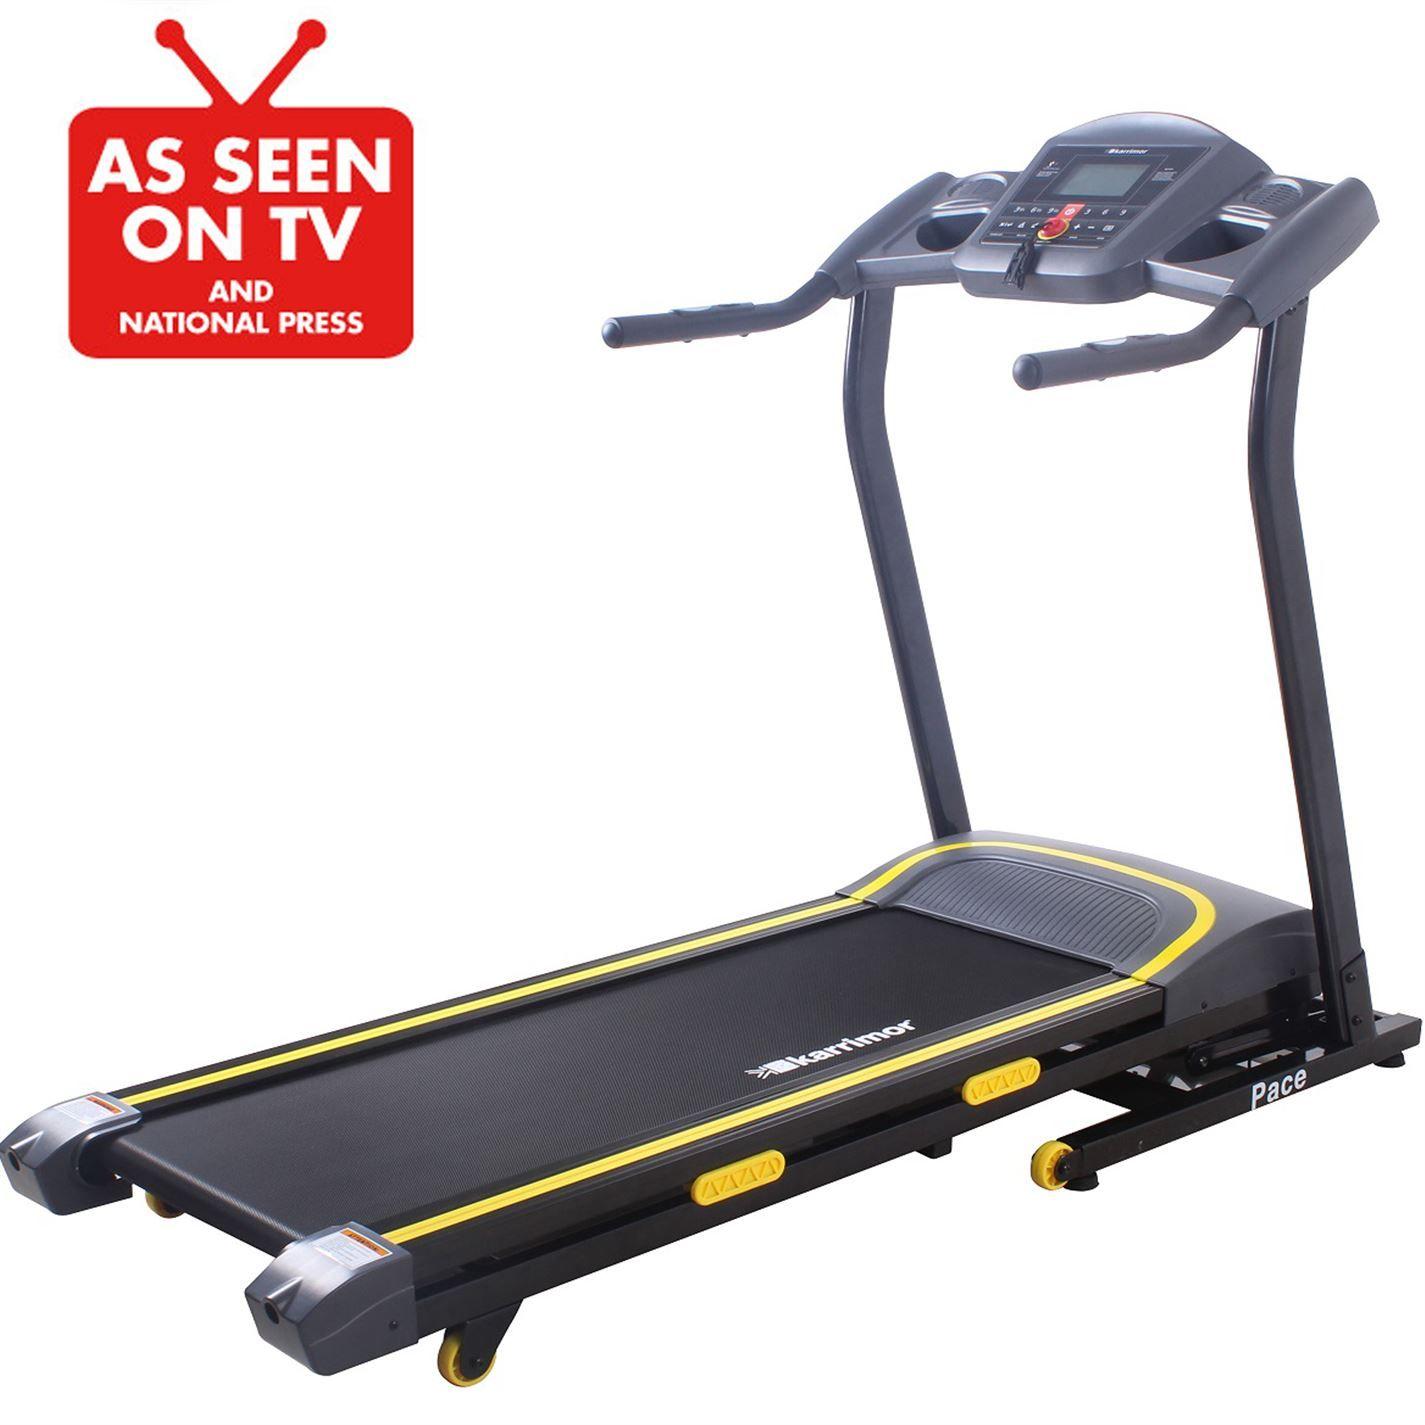 Karrimor | Karrimor Pace Treadmill | Treadmills | Wishlist | Pinterest